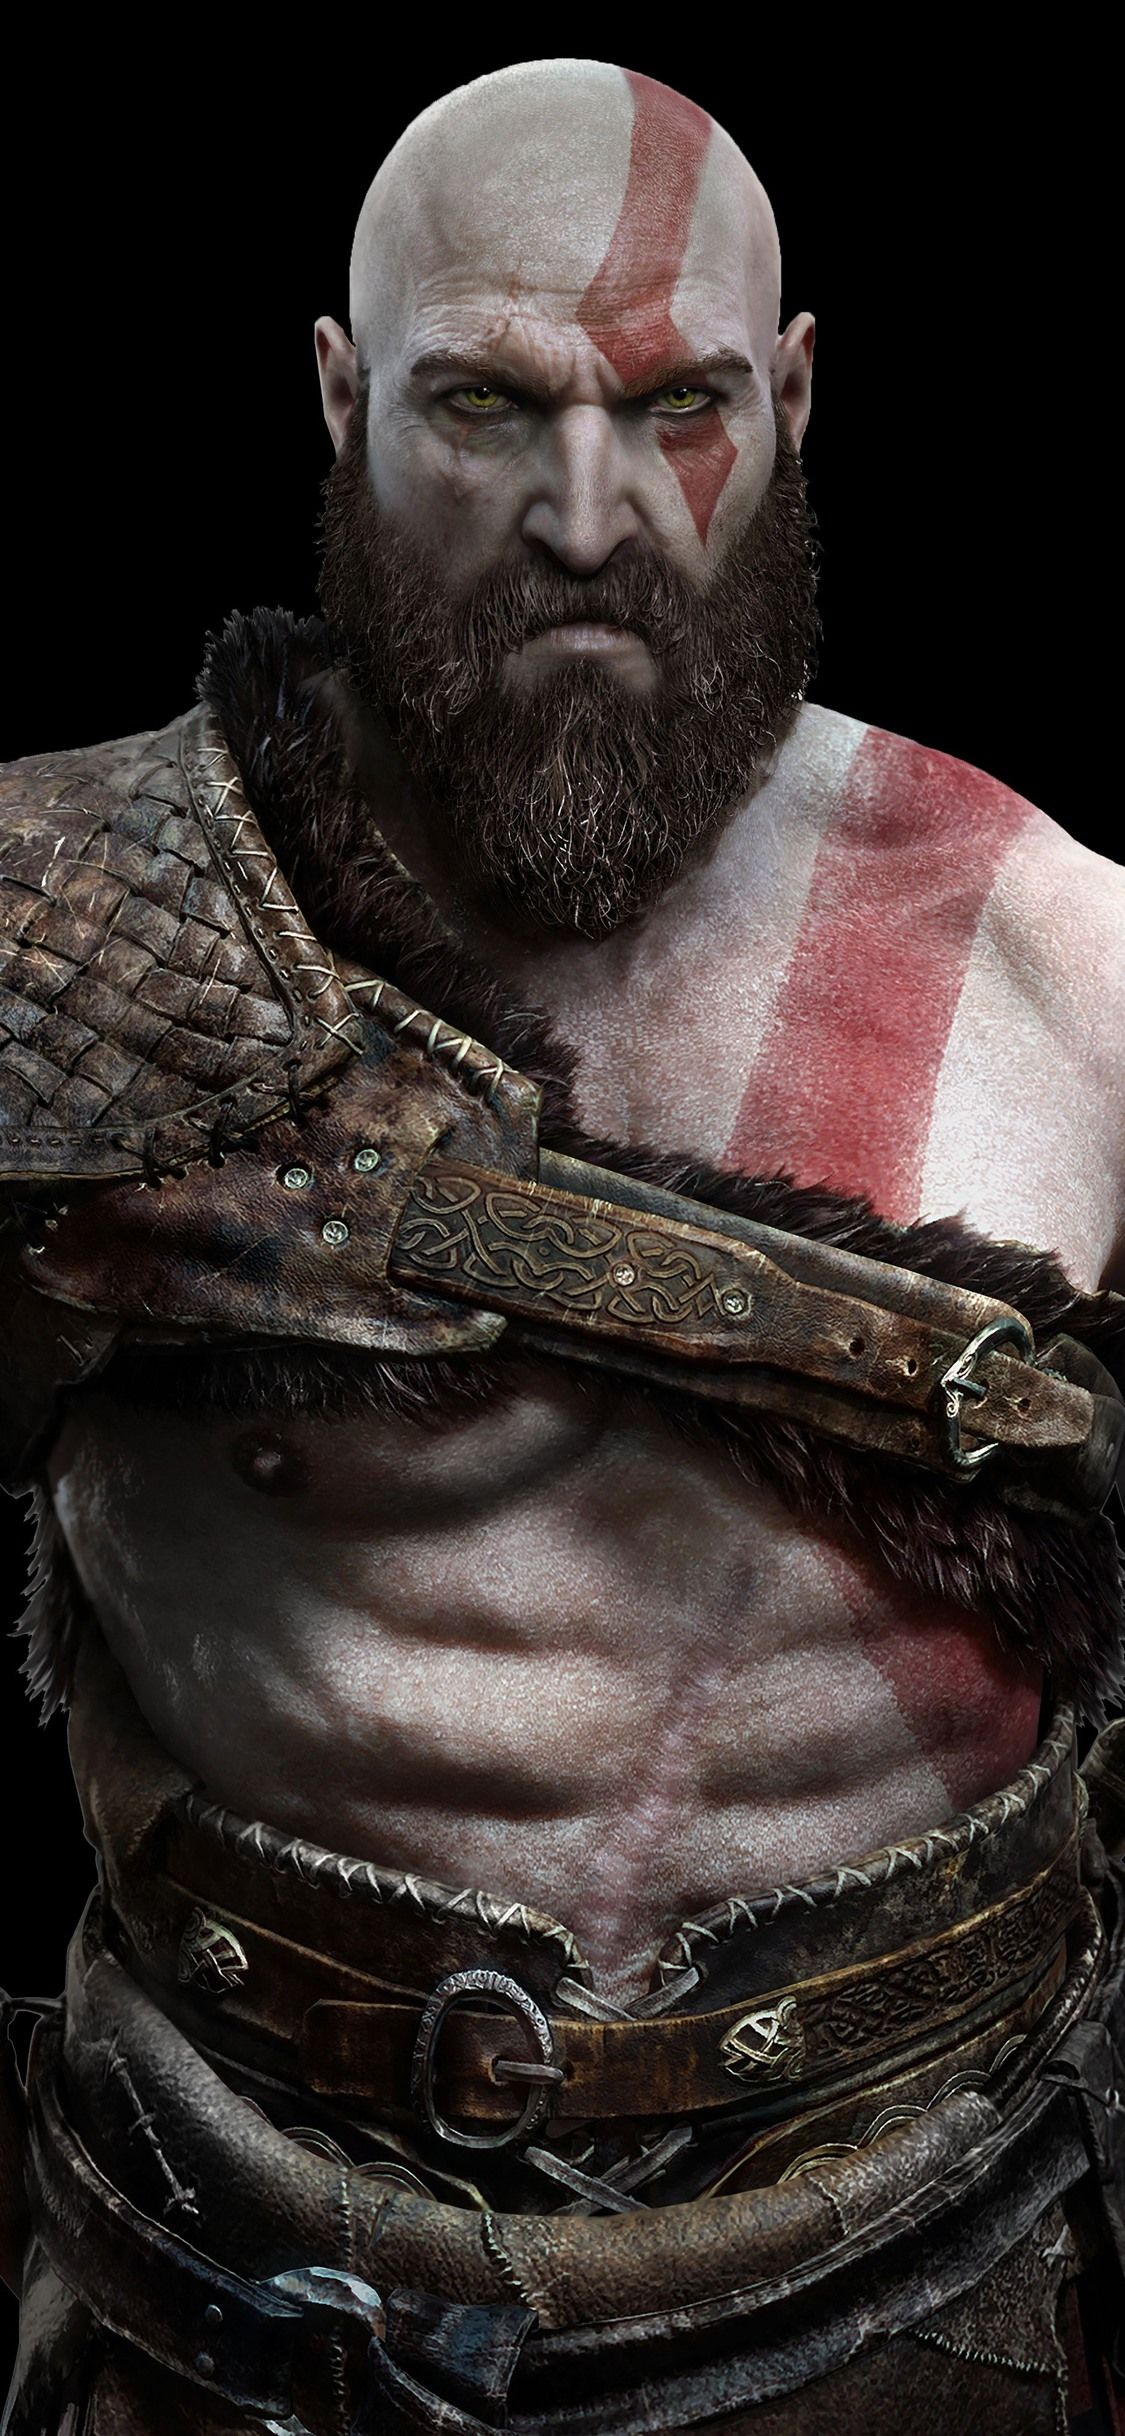 Best Of God Of War Wallpaper 4k Iphone Pictures Kratos God Of War God Of War Iphone Pictures